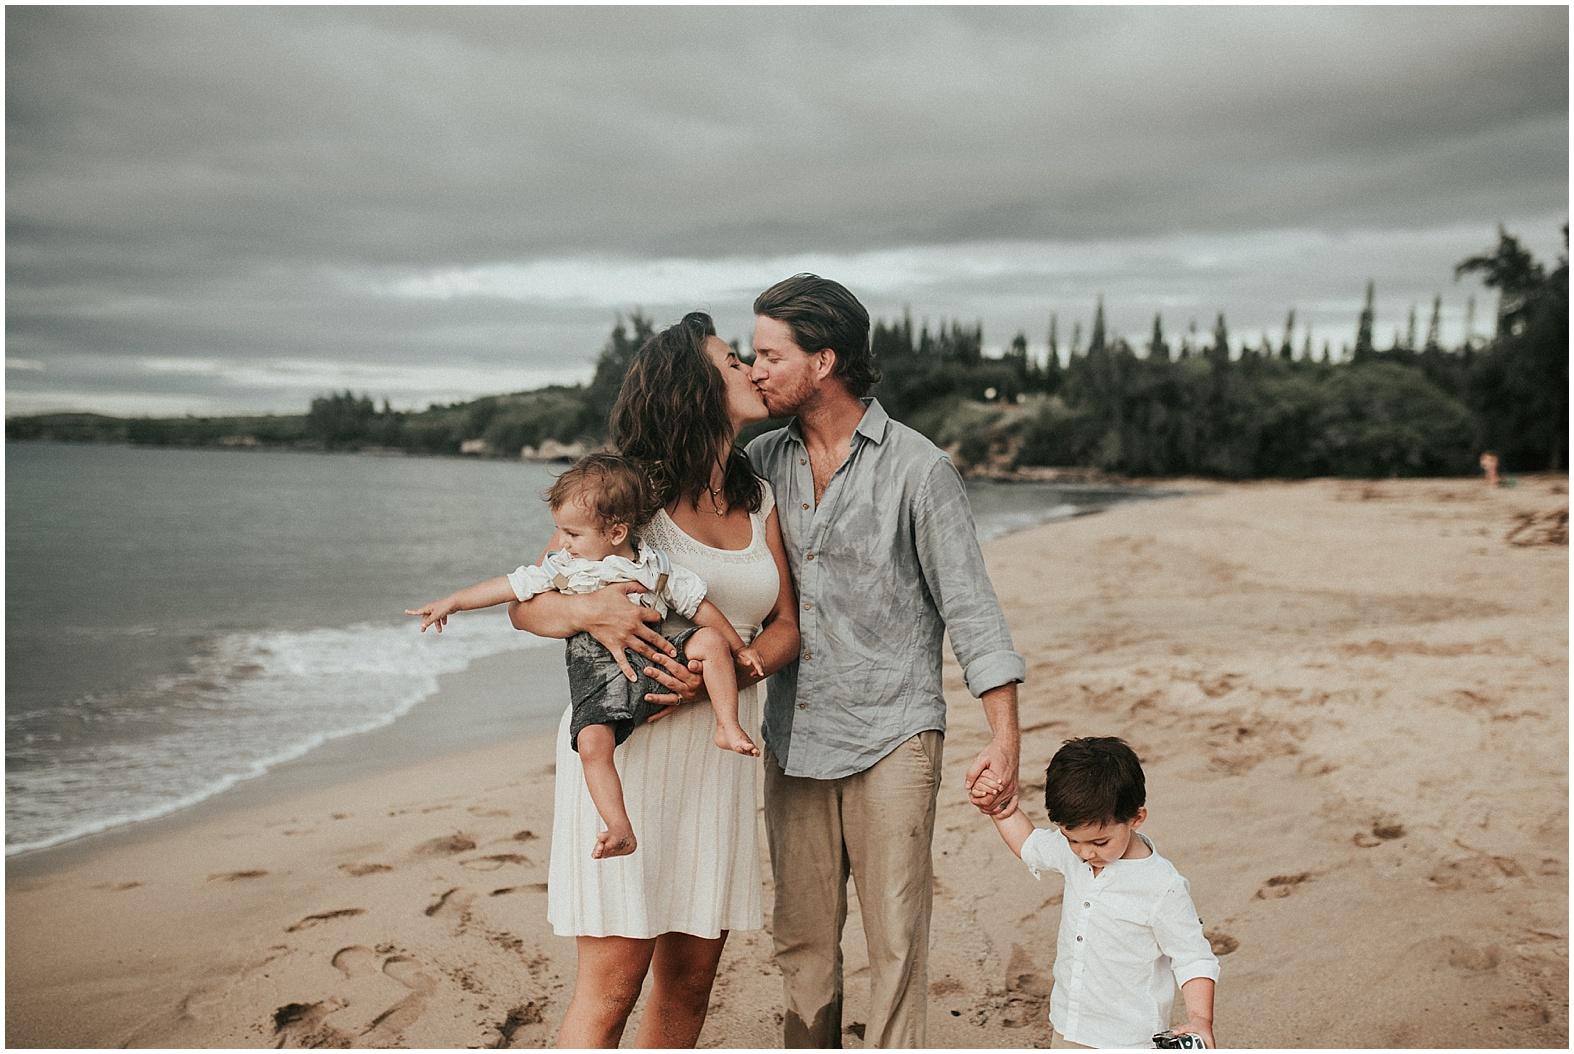 Maui family photography4.jpg